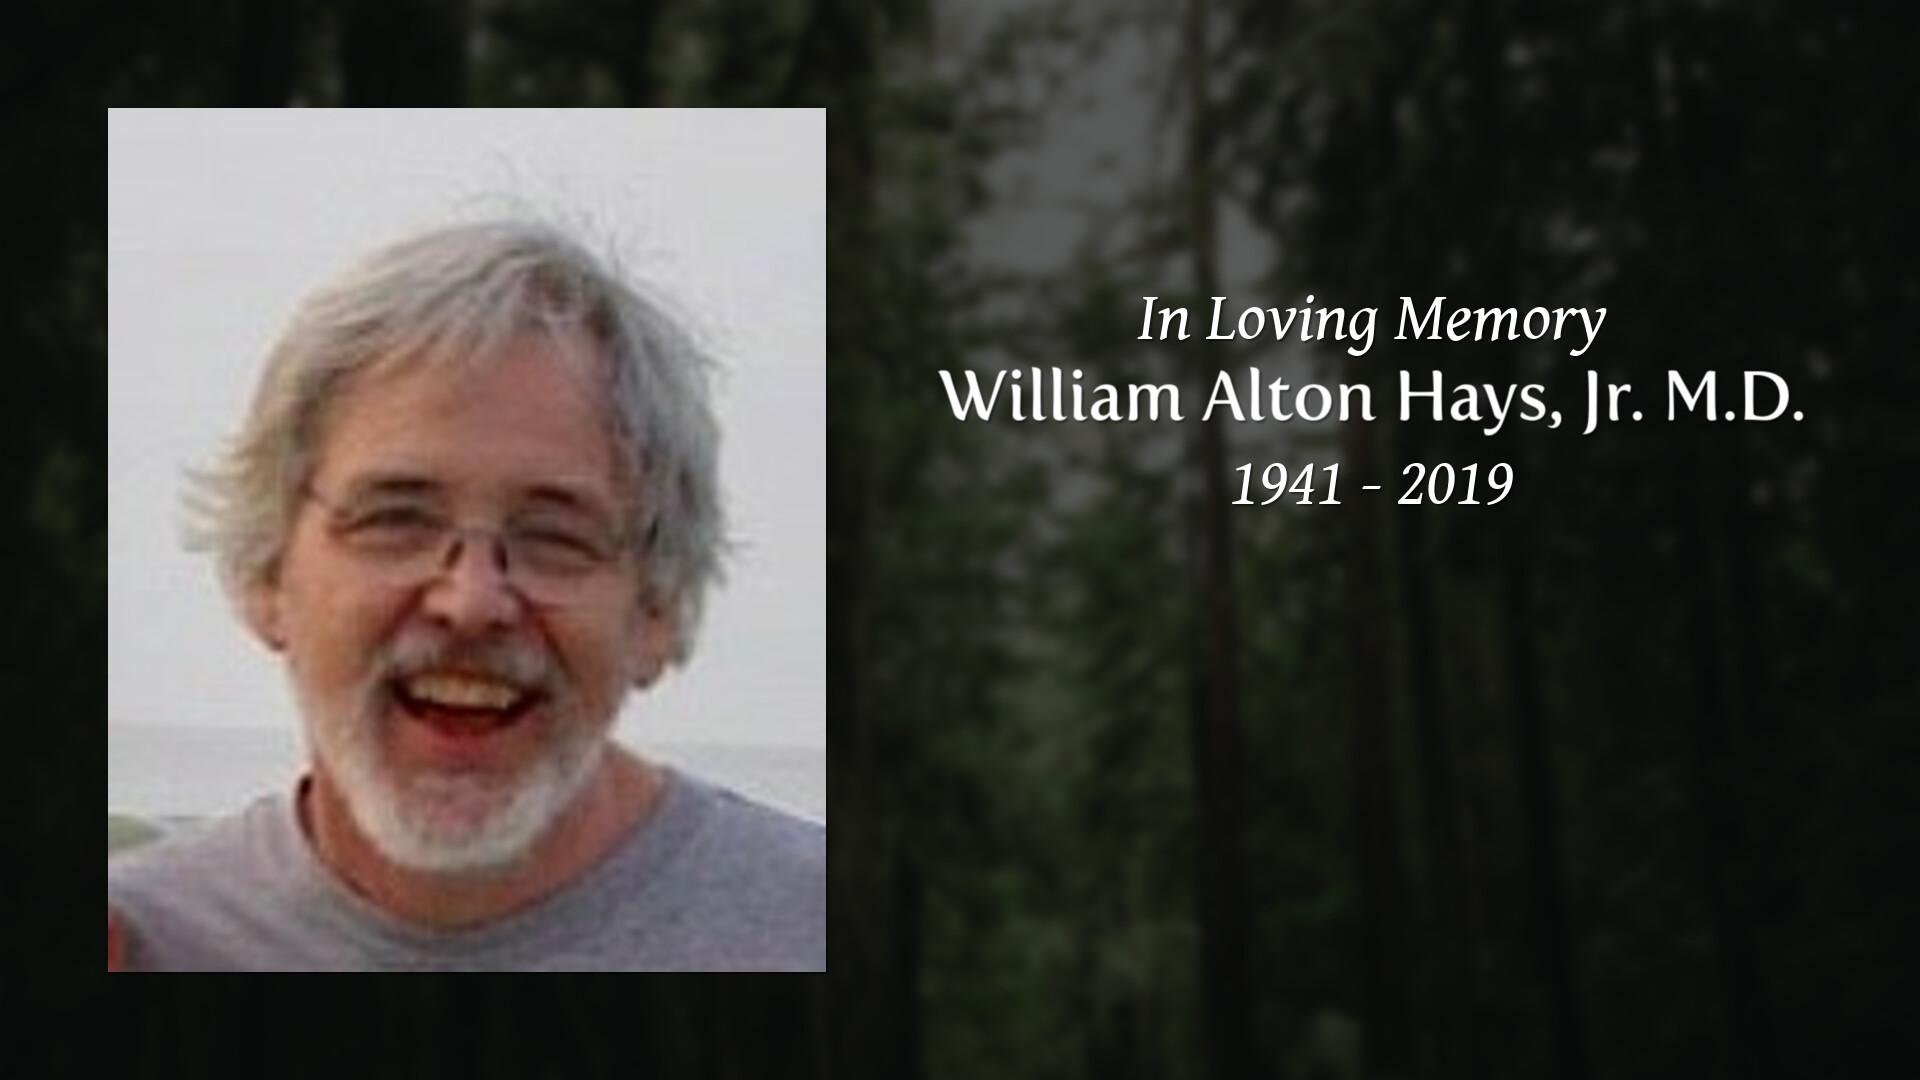 Obituary for William Alton Hays, Jr  M D  | Lord & Stephens